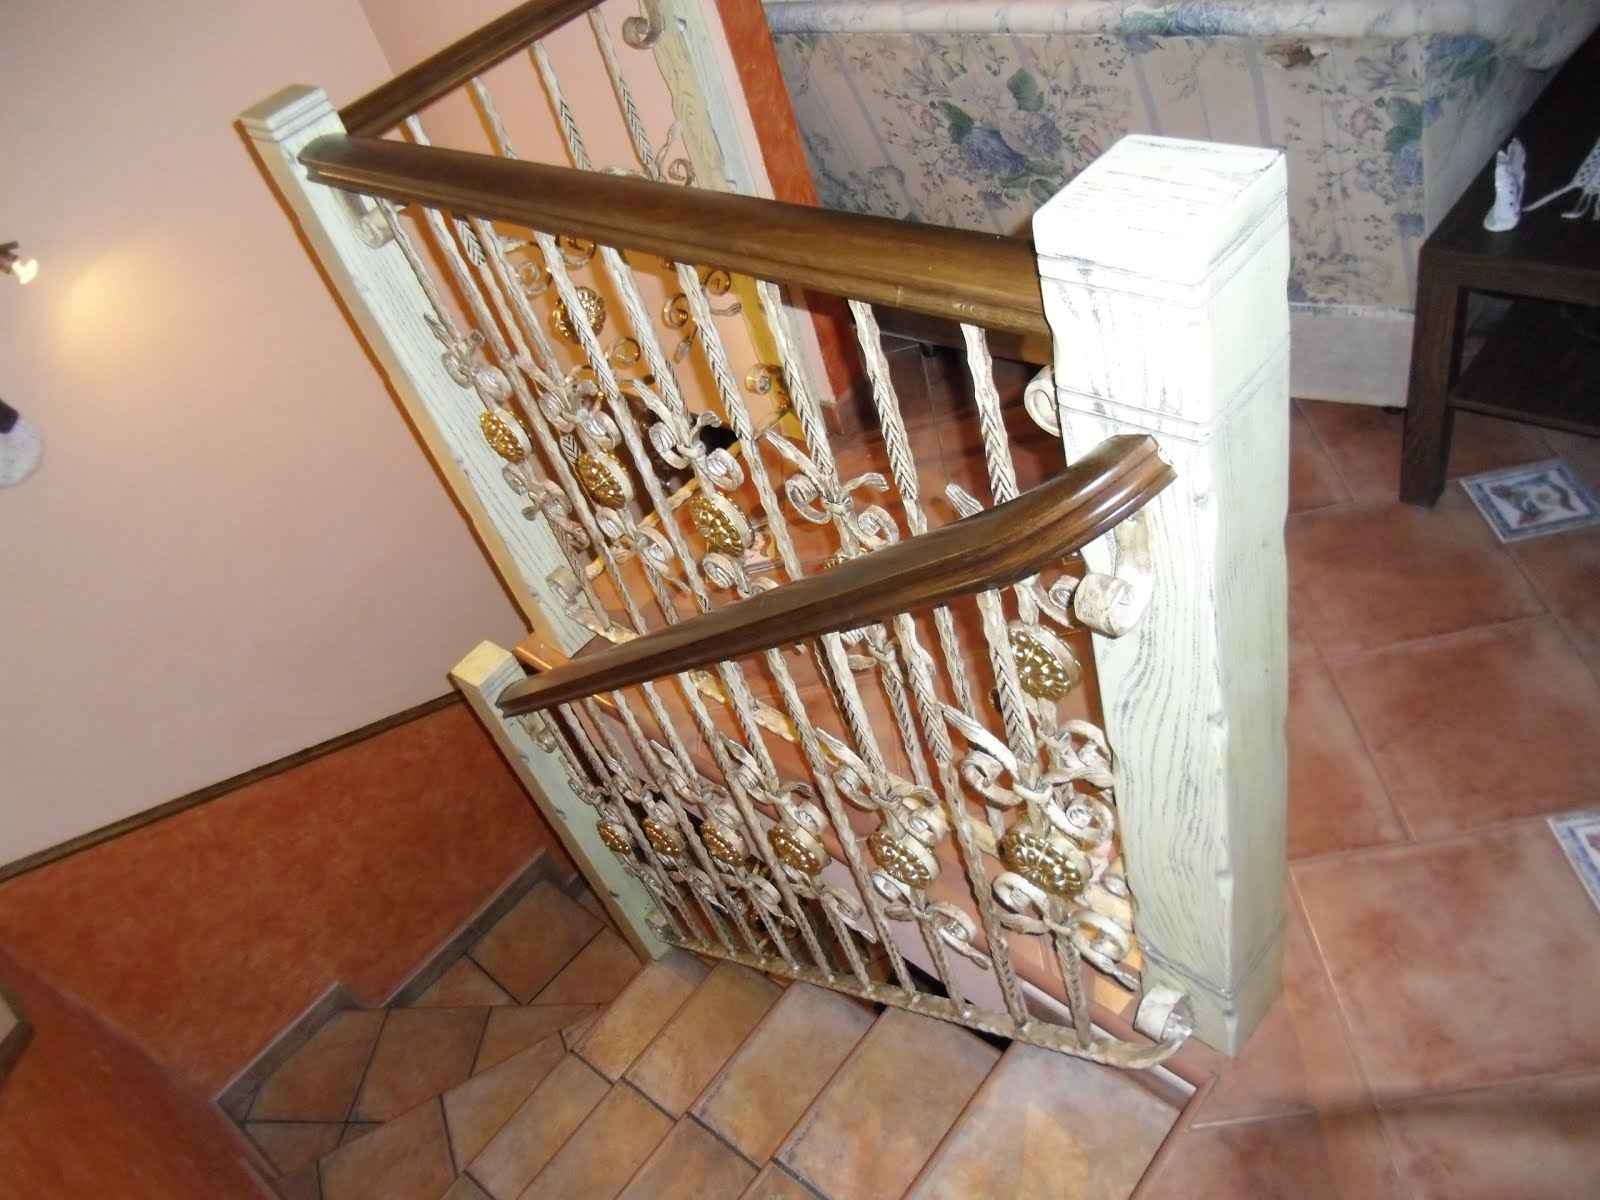 Carpinteria aguete pasamanos madera y forja - Pasamanos de madera para escaleras ...